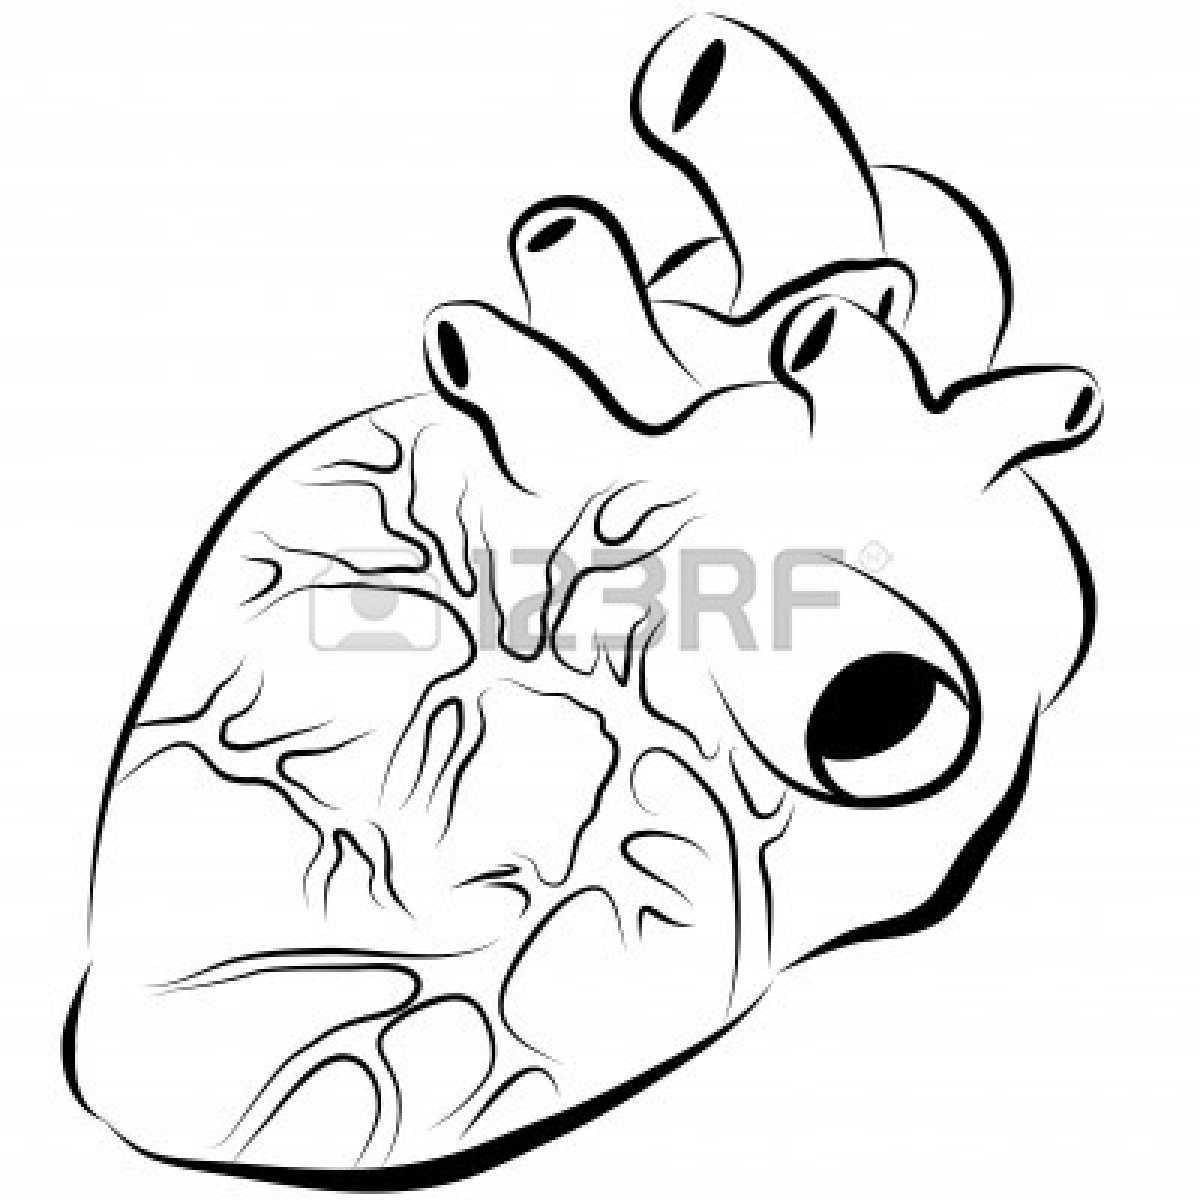 Human Heart Clipart Black And White Clipart Panda